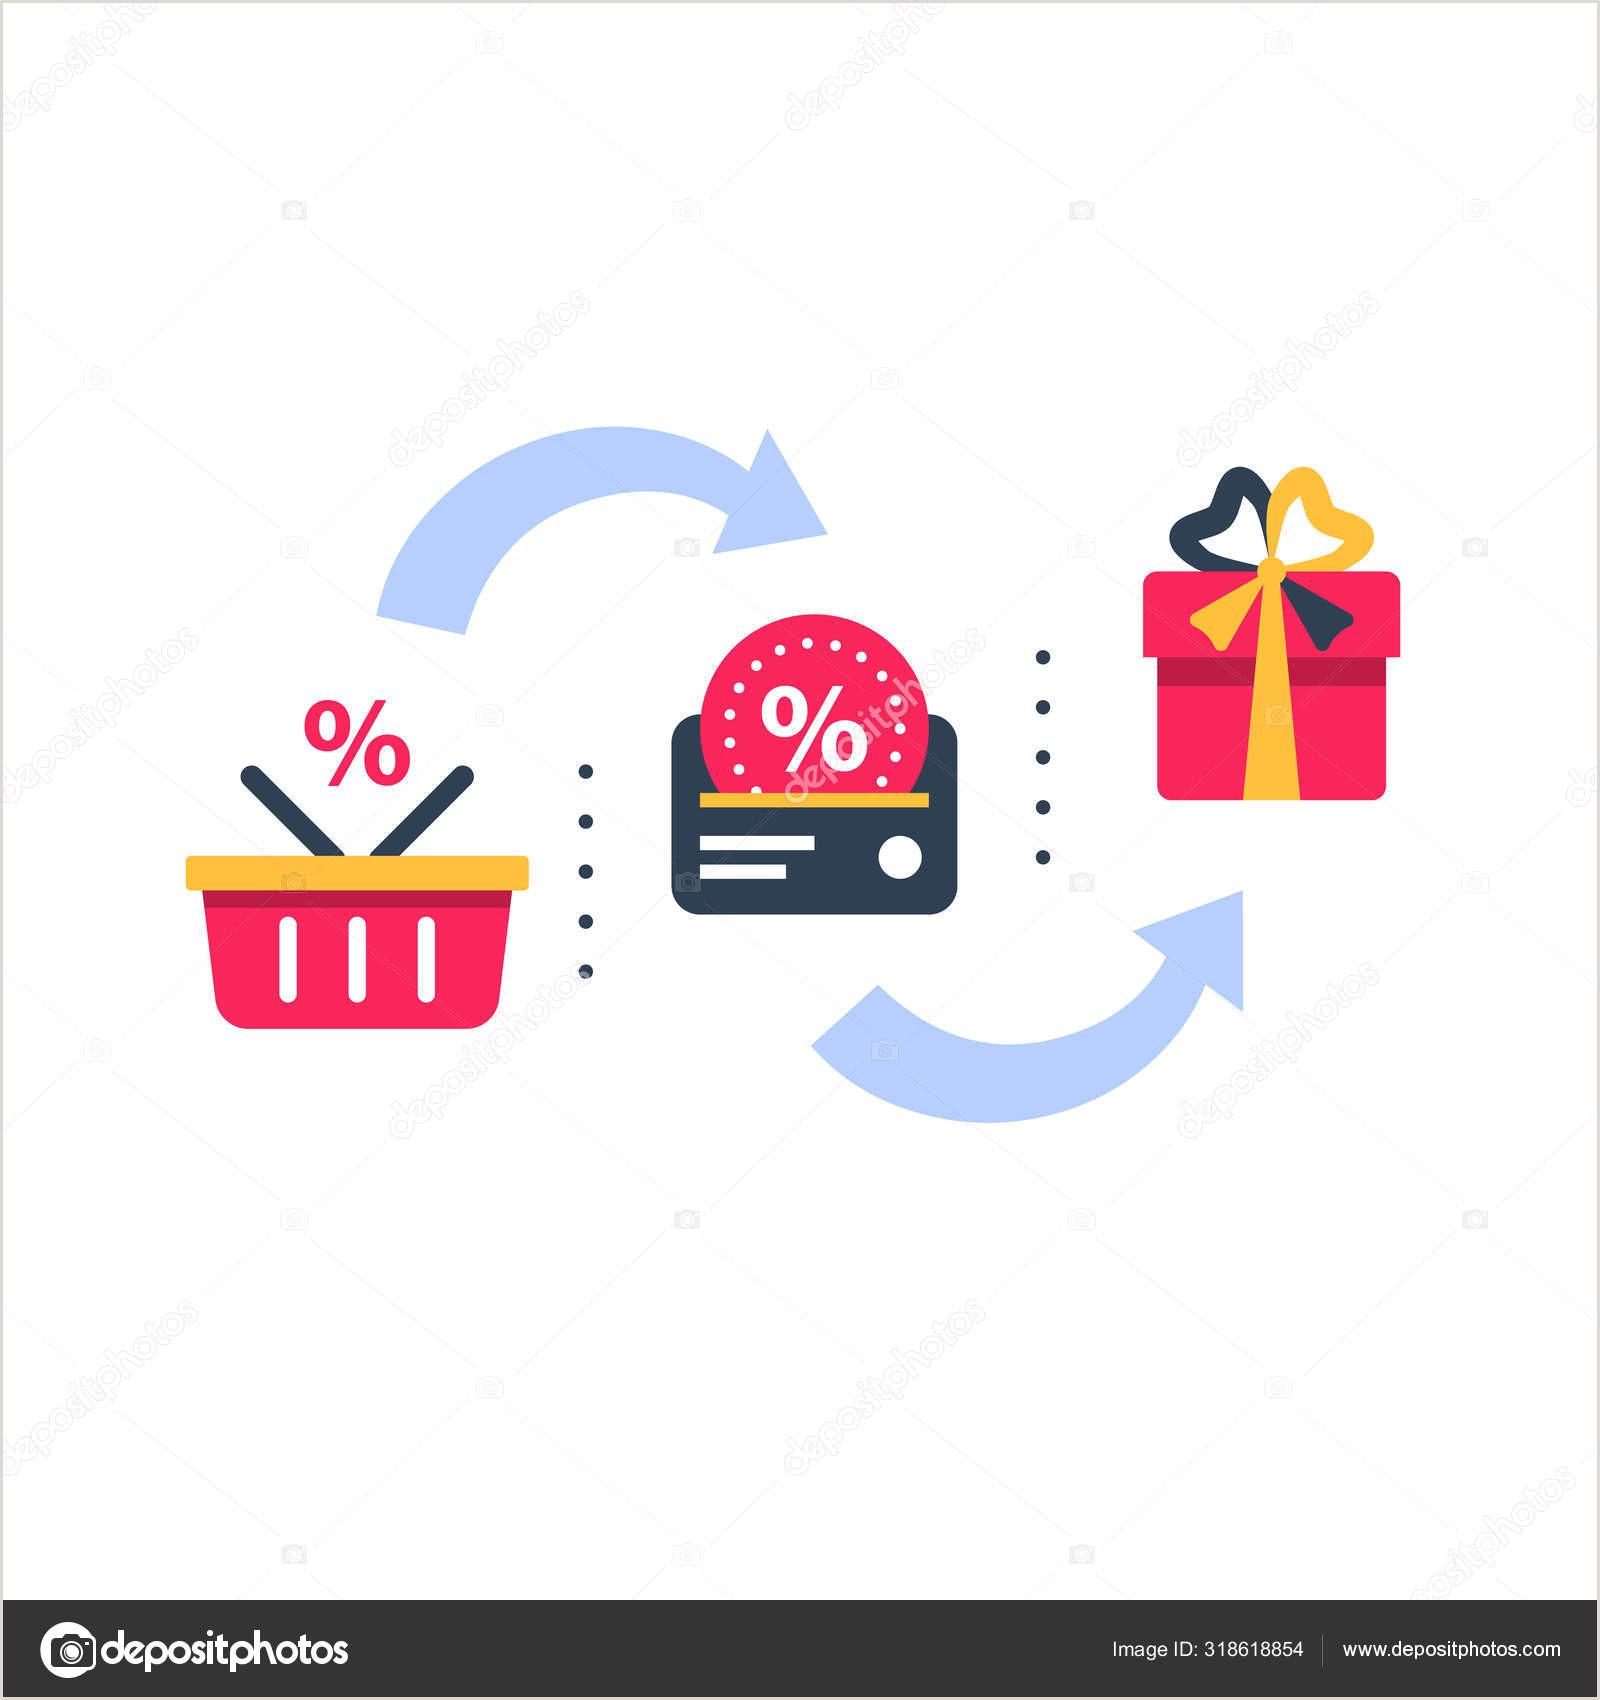 Best Business Cards Points Bonus Loyalty Card Incentive Program Vector Icon Set Earn Bonus Points For Purchase Discount Coupon Cash Back